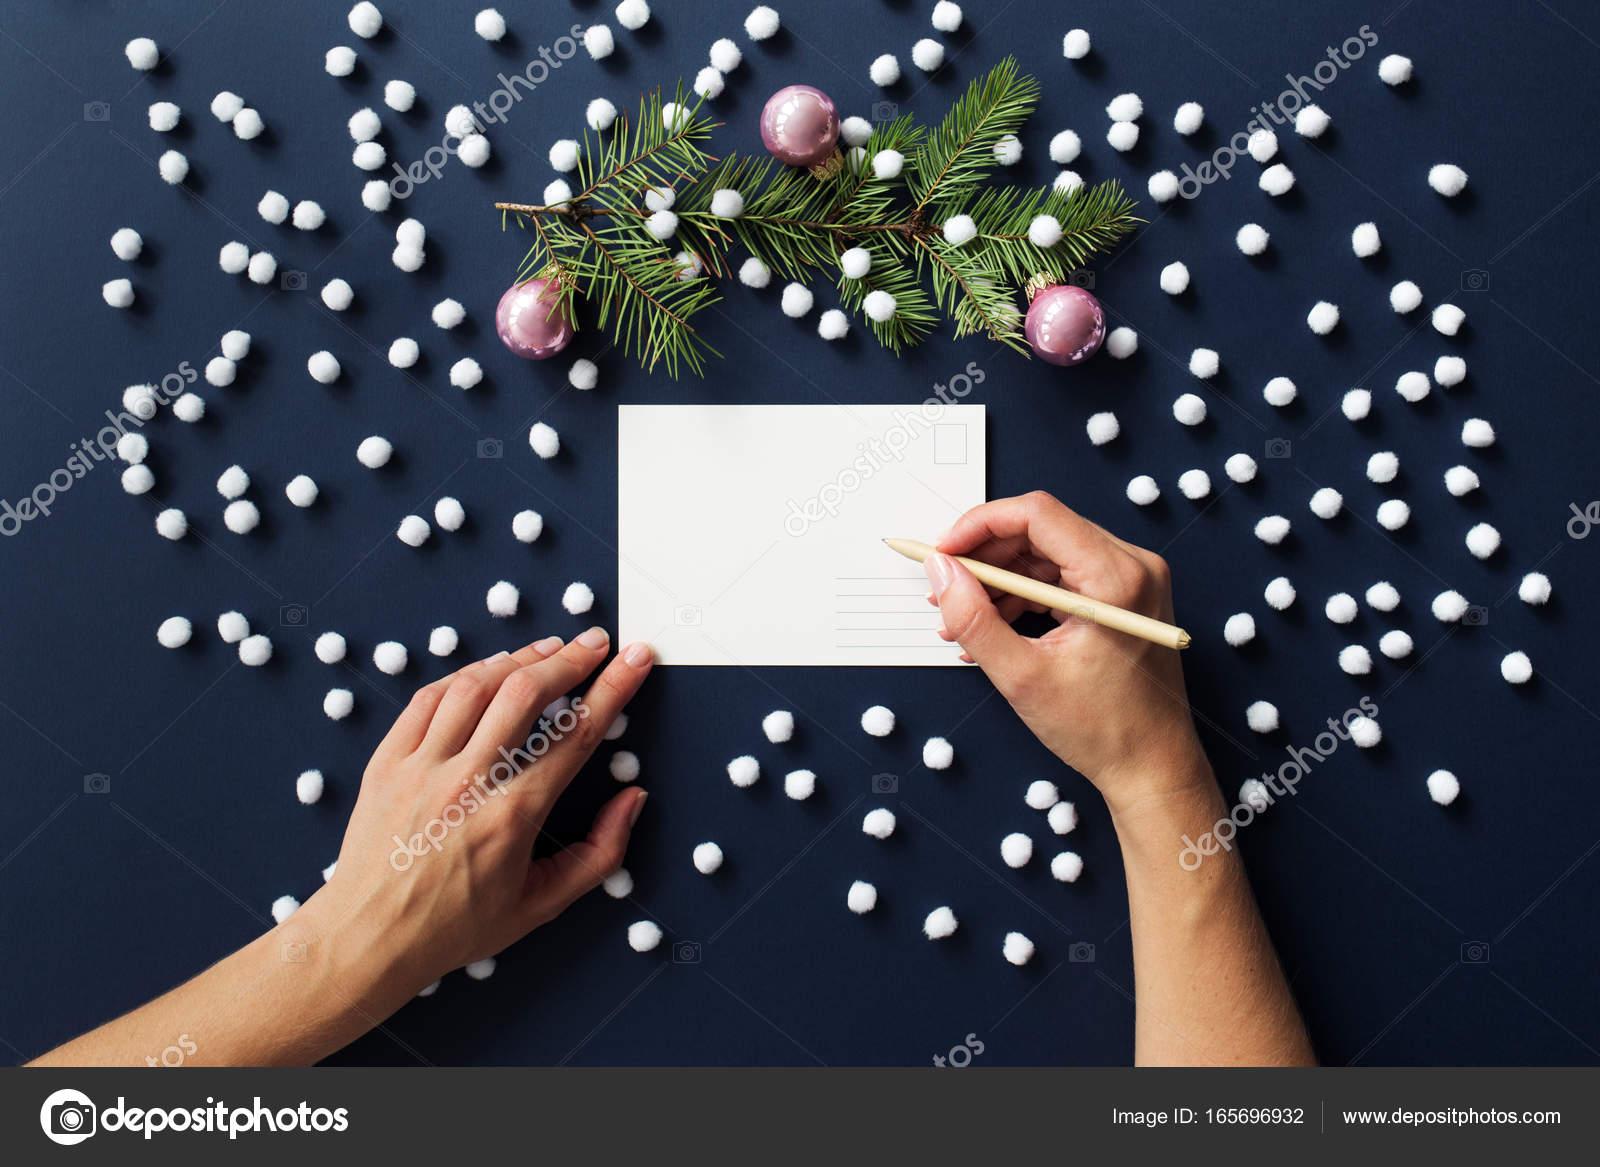 Writing hand dark blue christmas card stock photo olliulli hands write on christmas card snowy dark blue background spruce branch with pink christmas ball photo by olliulli m4hsunfo